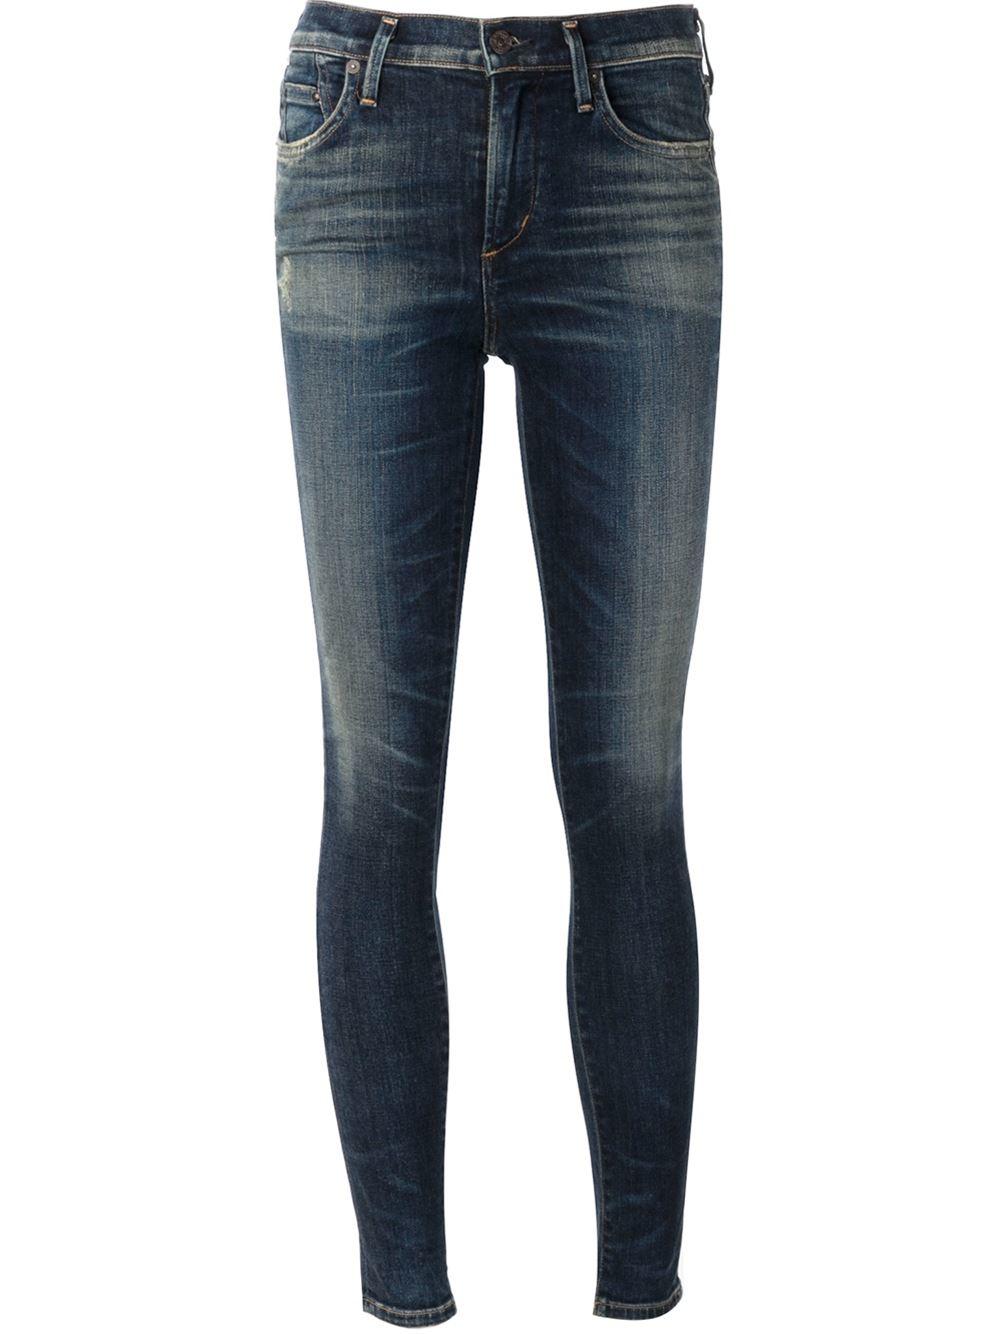 citizens of humanity 39 rocket 39 skinny jeans in blue lyst. Black Bedroom Furniture Sets. Home Design Ideas